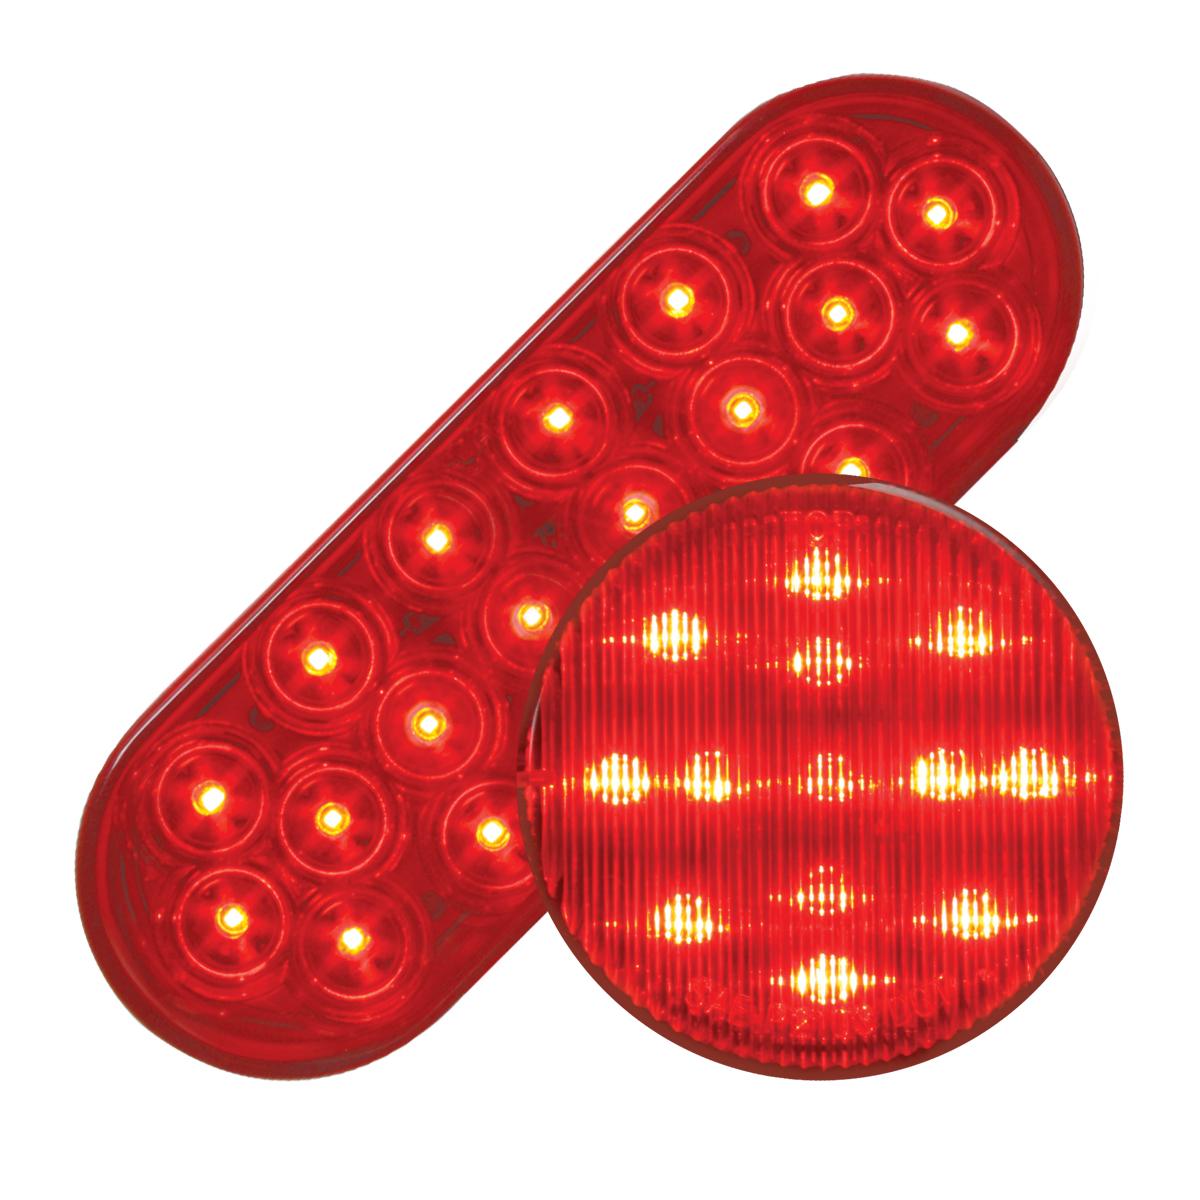 #87721/#79311 Fleet LED Flat - Red/Red